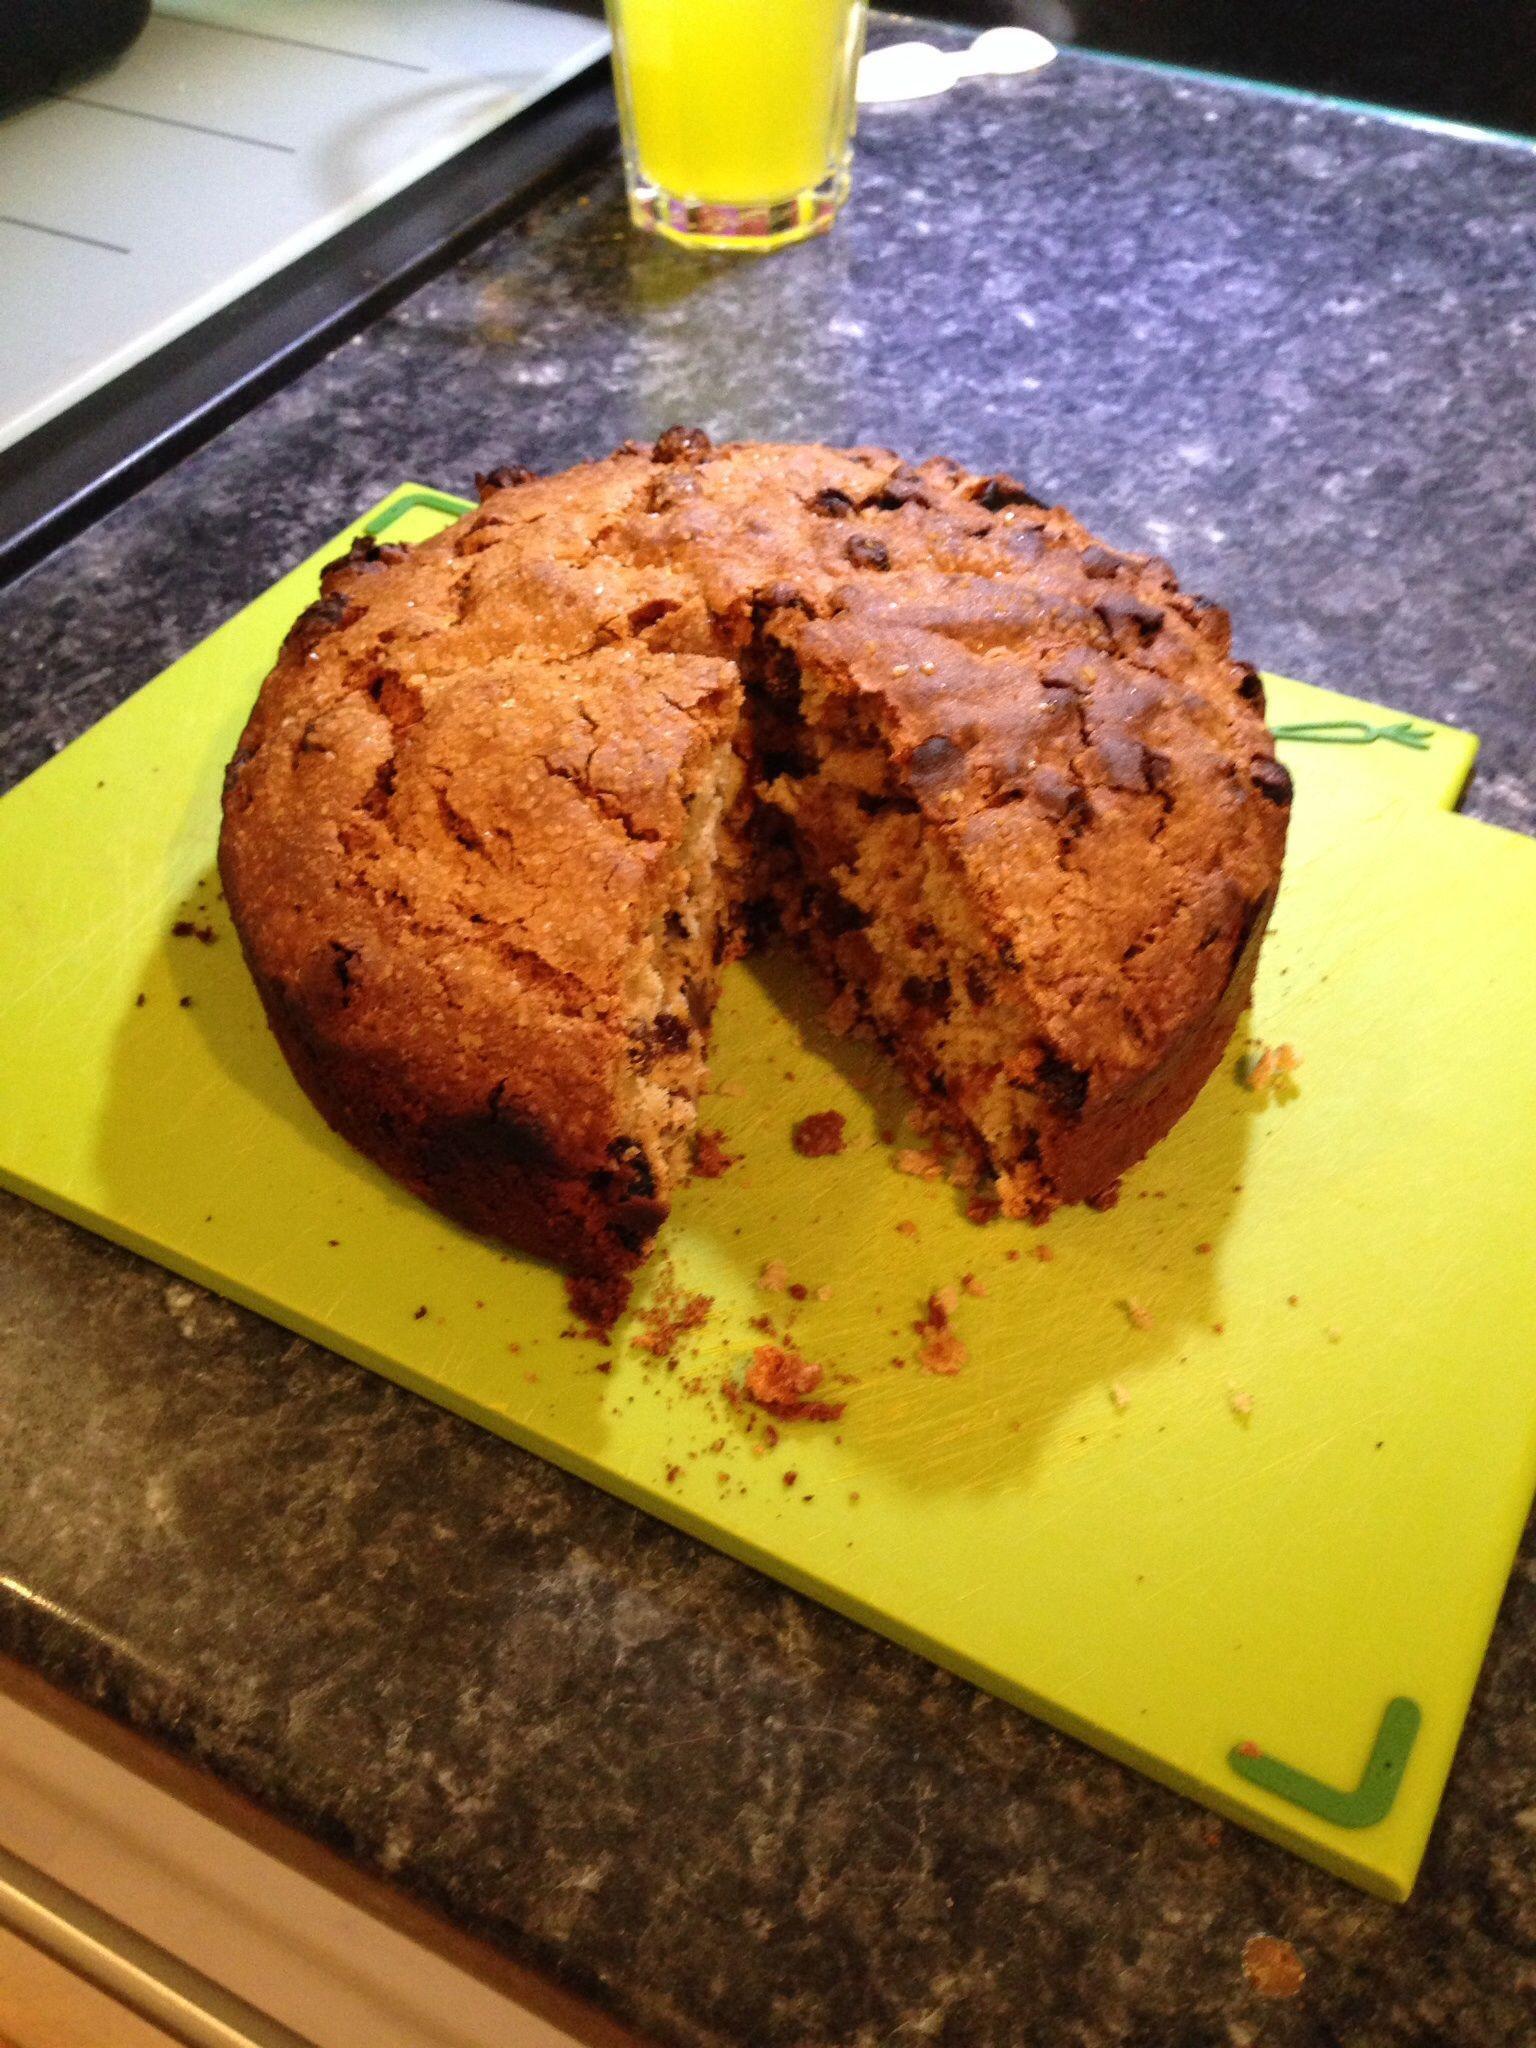 Fruit Cake Recipe Easy  Quick & Easy Fruit Cake recipe All recipes UK